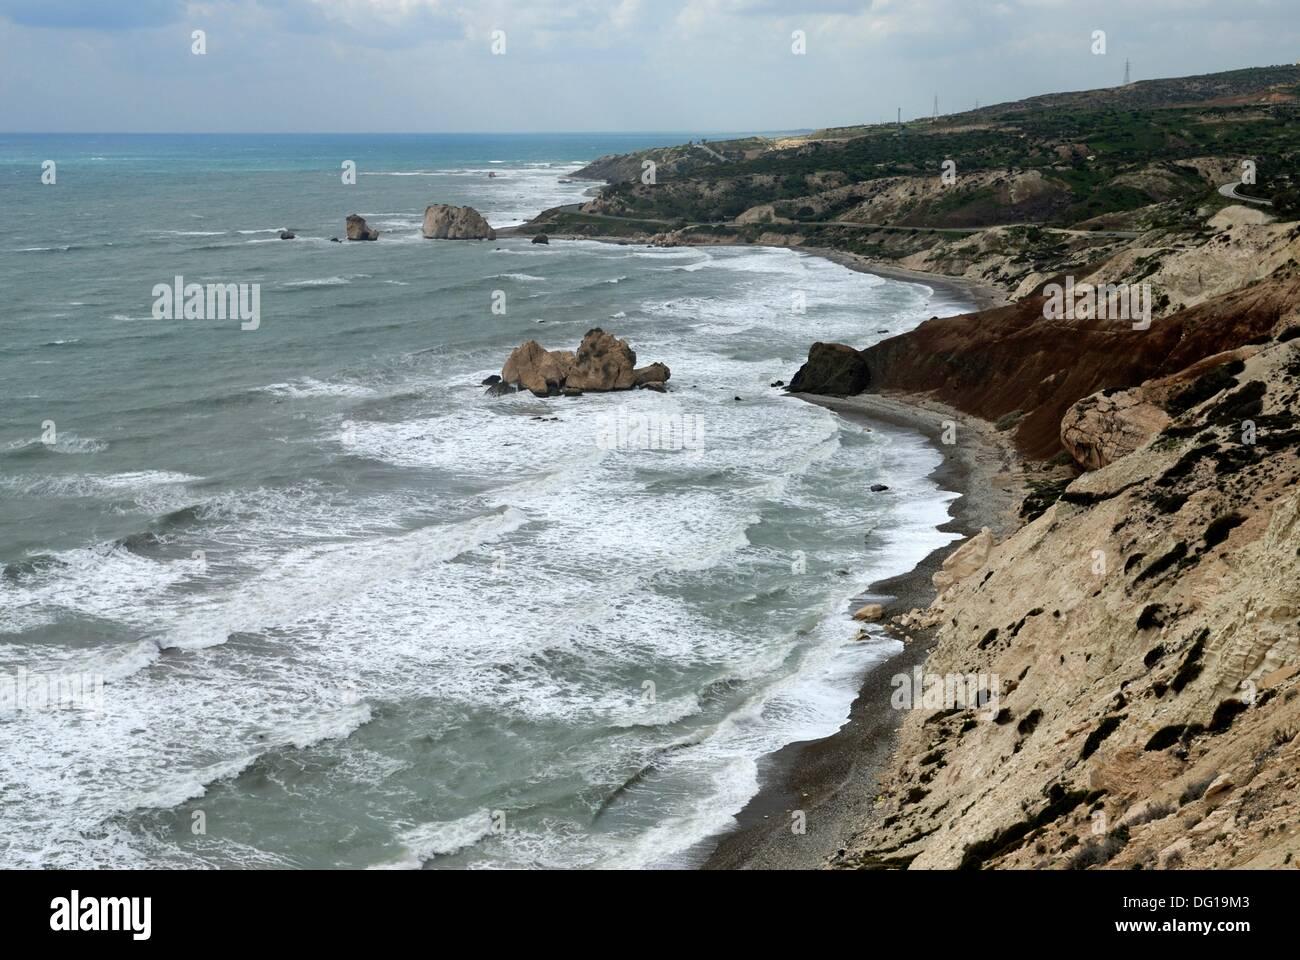 Petra Tou Romiou Website, legendäre Aphrodite´s Geburtsort, Zypern, östlichen Mittelmeer Insel, Eurasien Stockbild